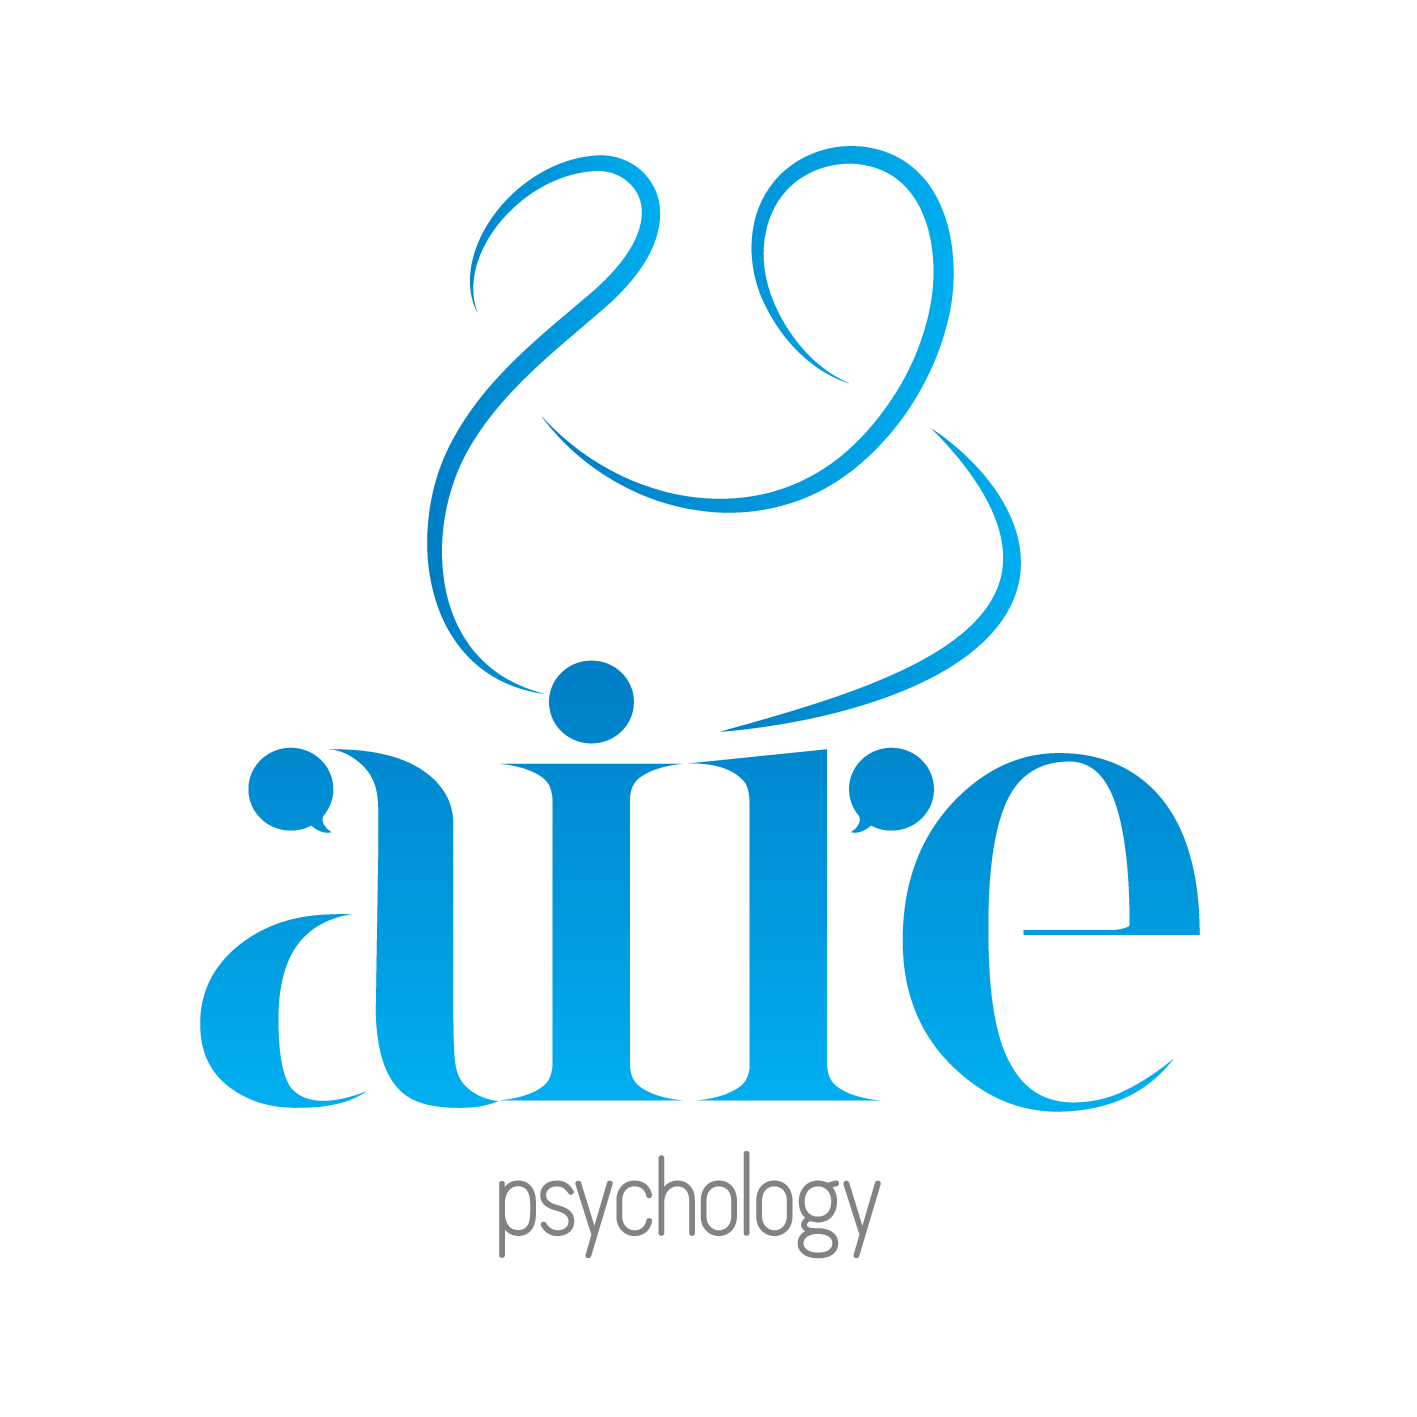 aire psychology